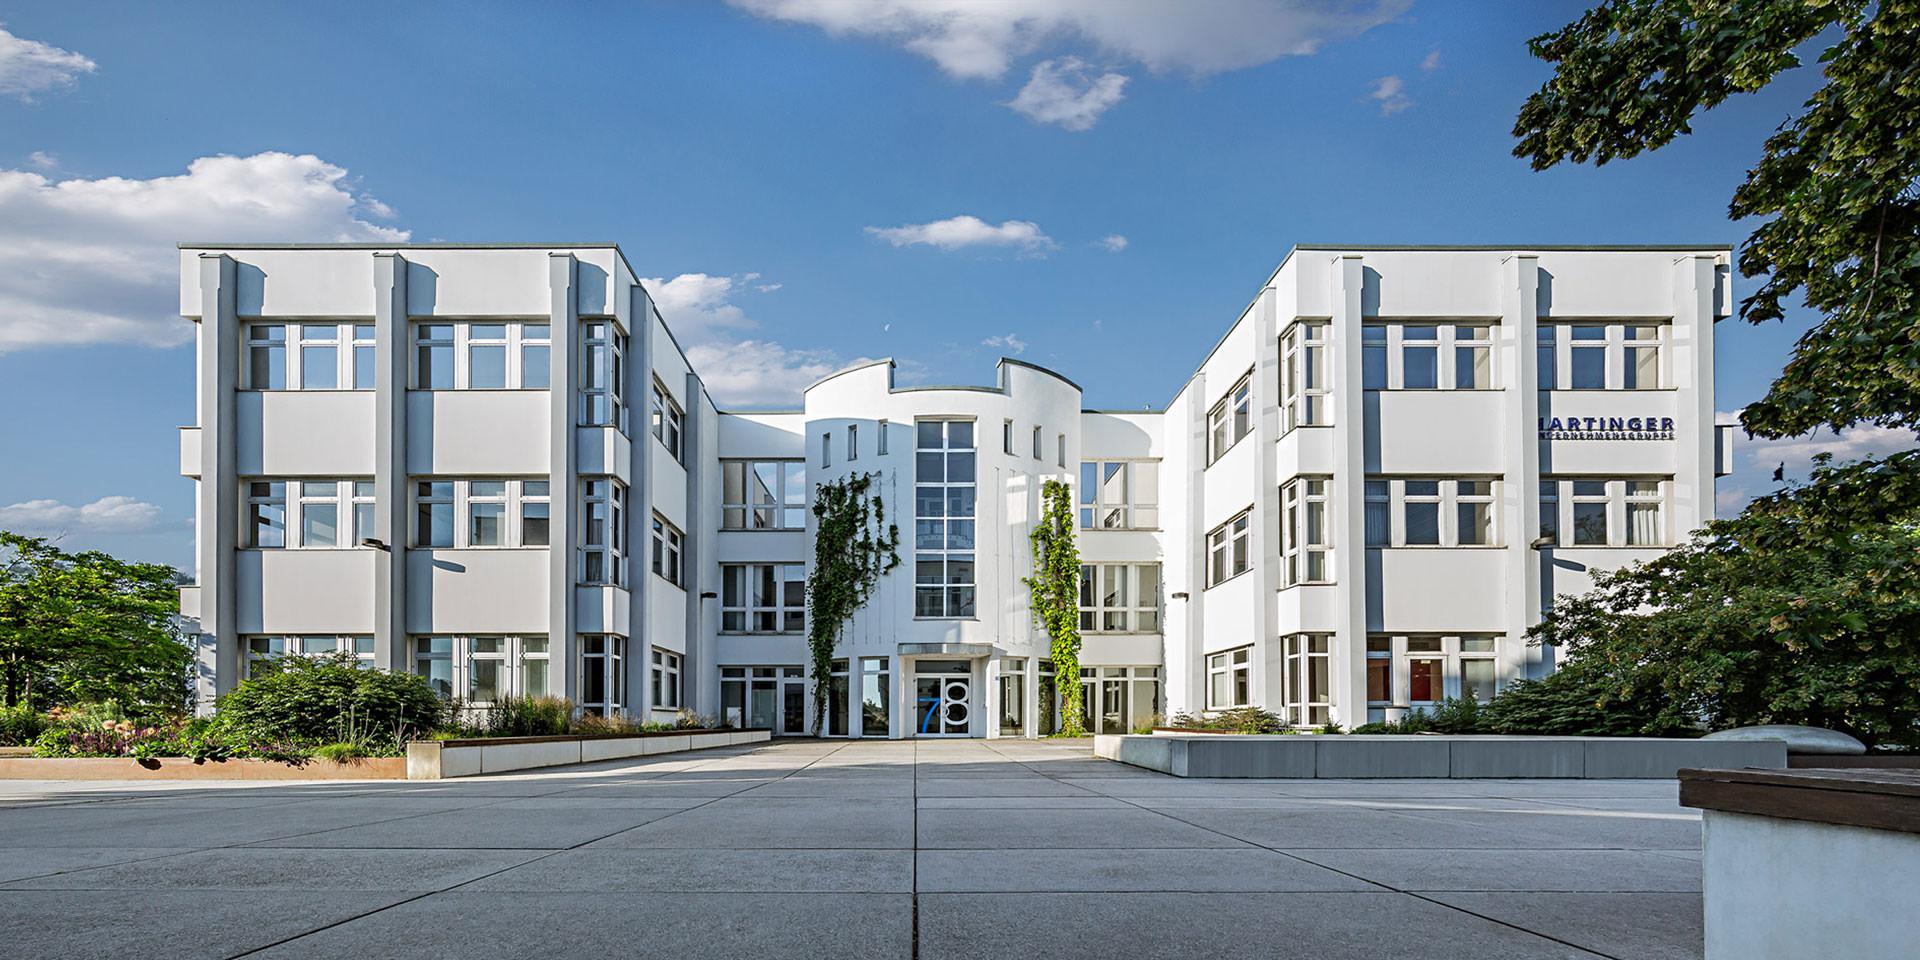 Rosenheimer Straße 78 in Kolbermoor